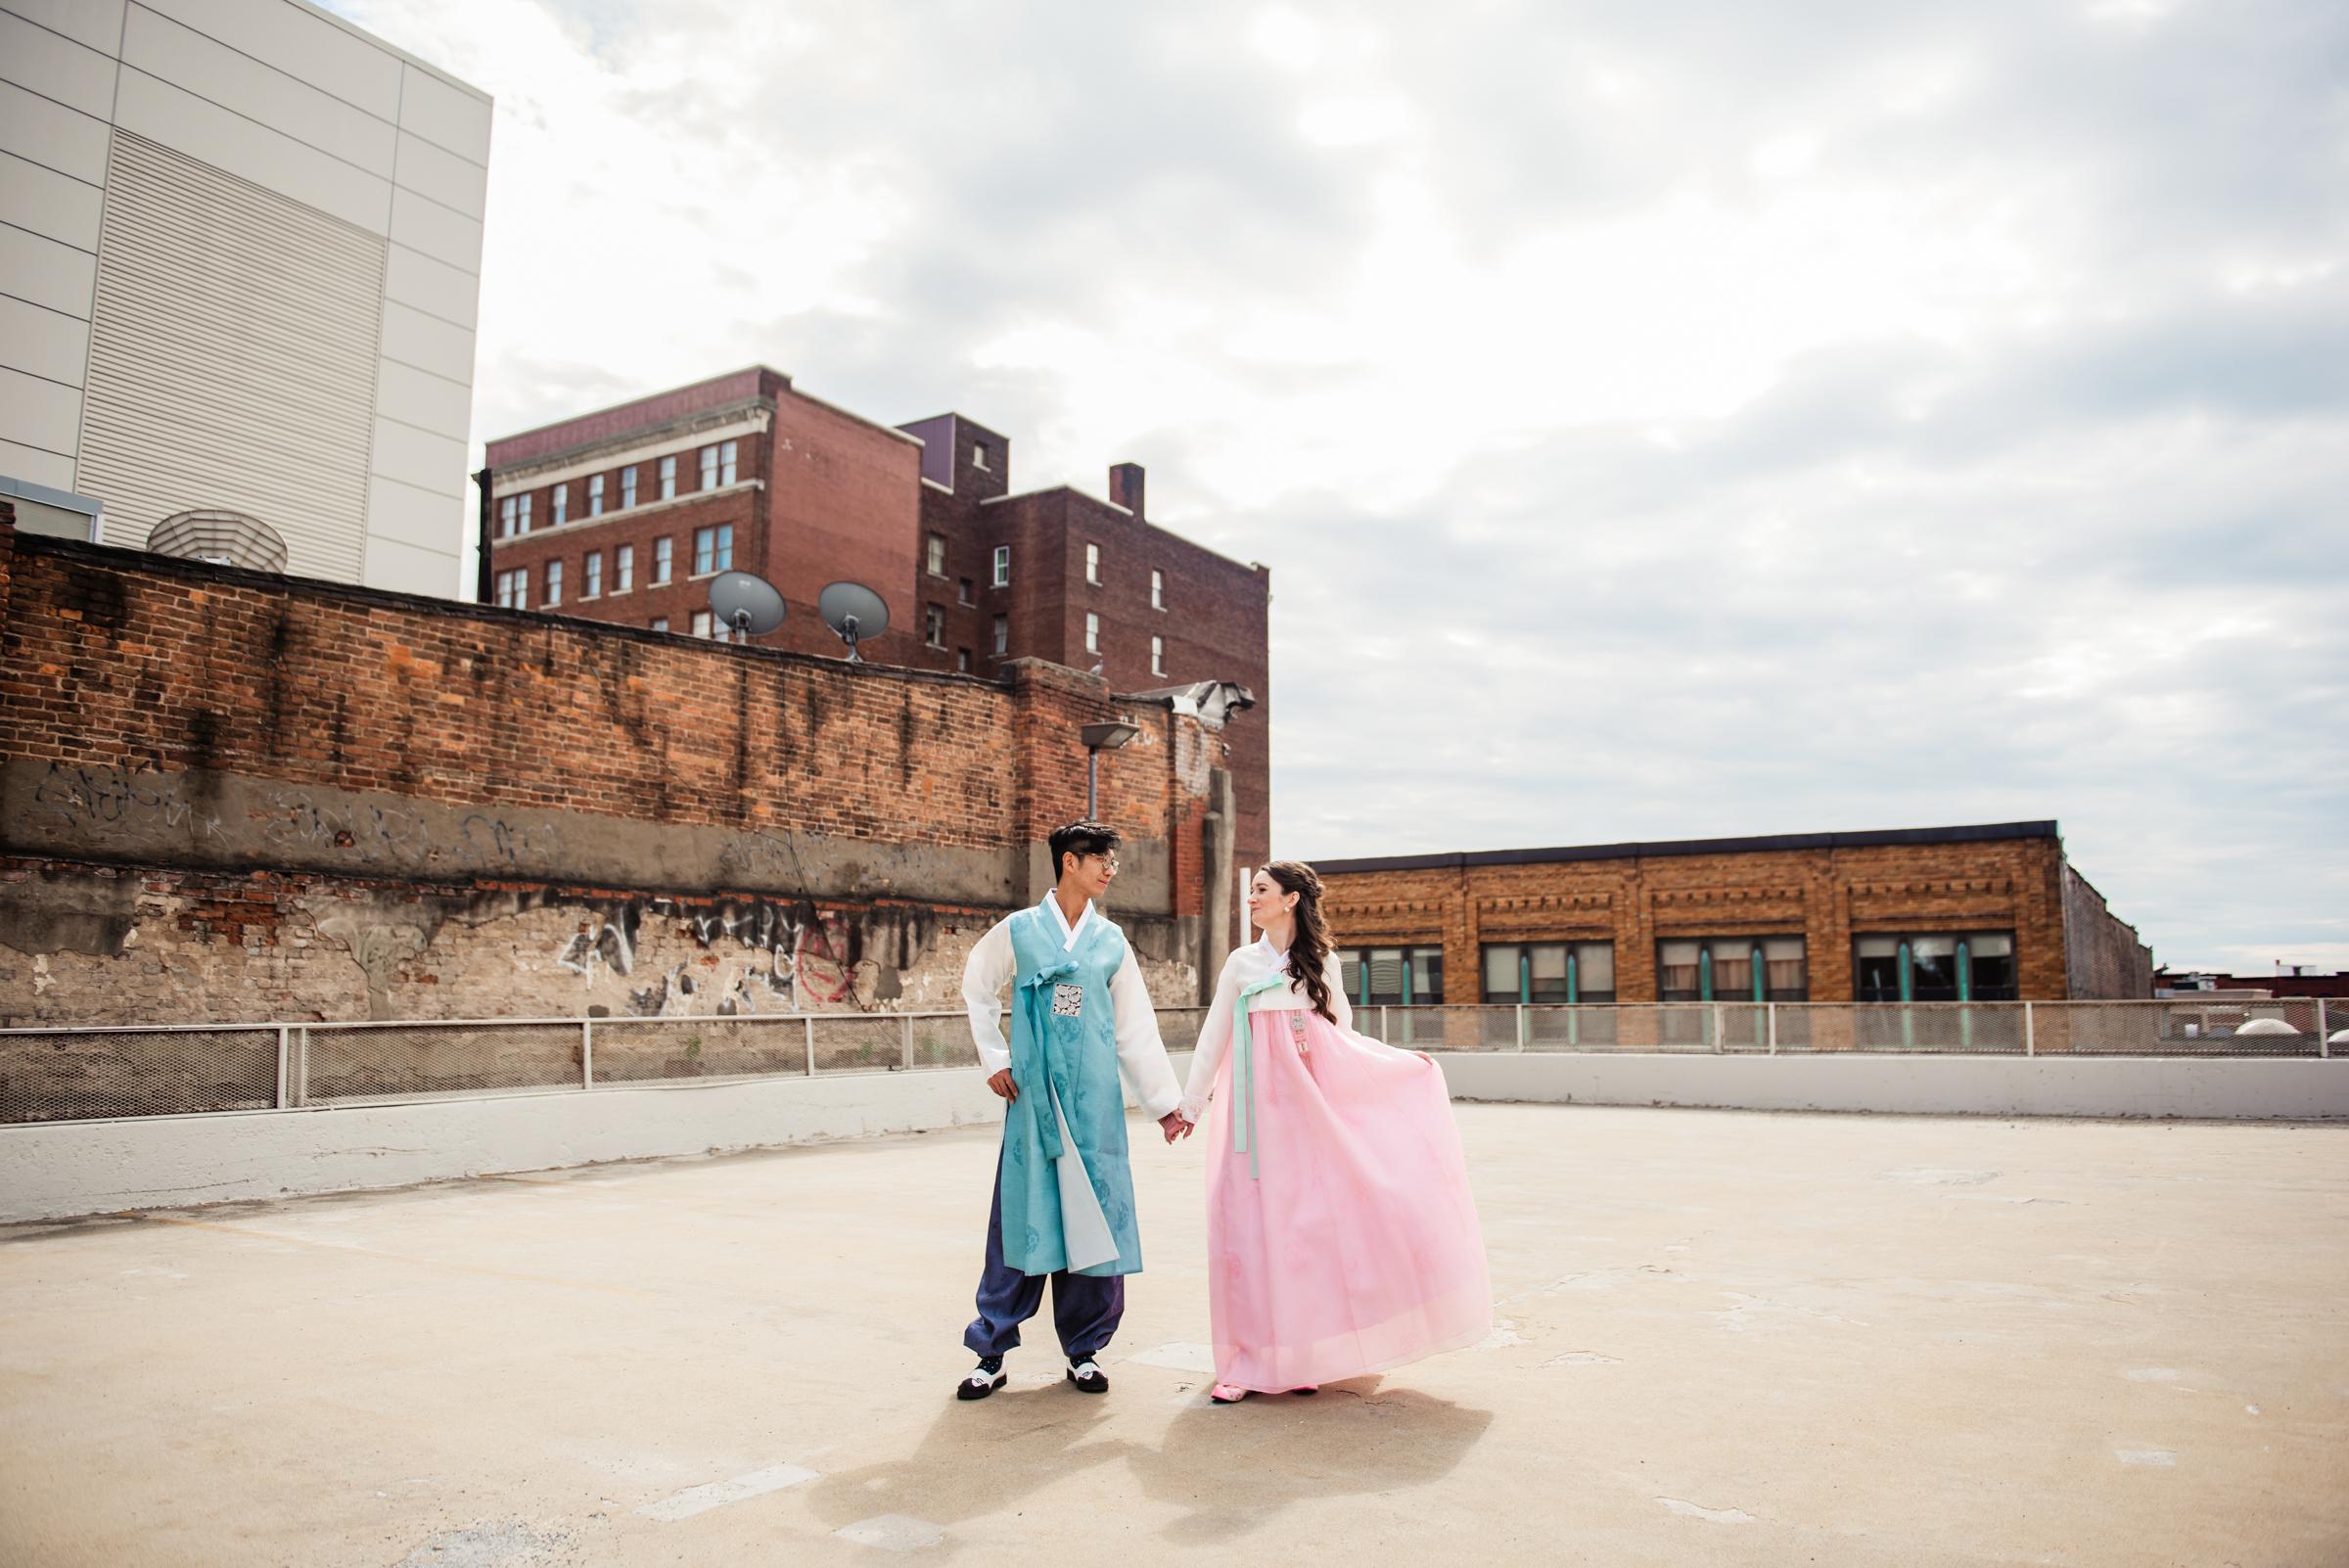 SKY_Armory_Syracuse_Wedding_JILL_STUDIO_Rochester_NY_Photographer_DSC_5605.jpg